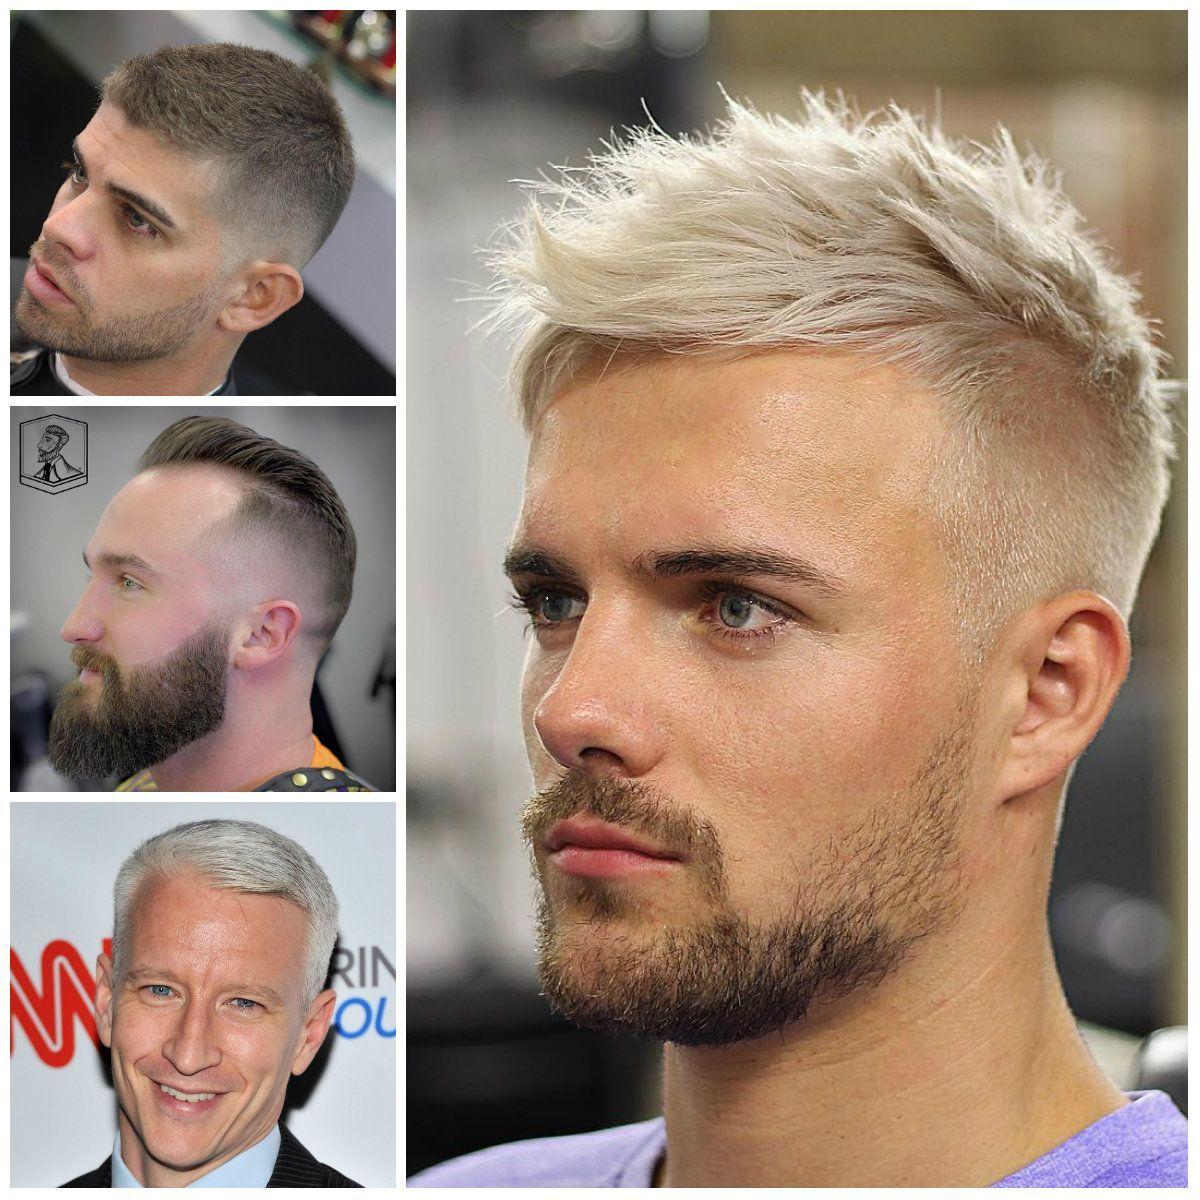 Frisuren Nach Haarausfall In 2020 Stilvolle Frisuren Haar Styling Haare